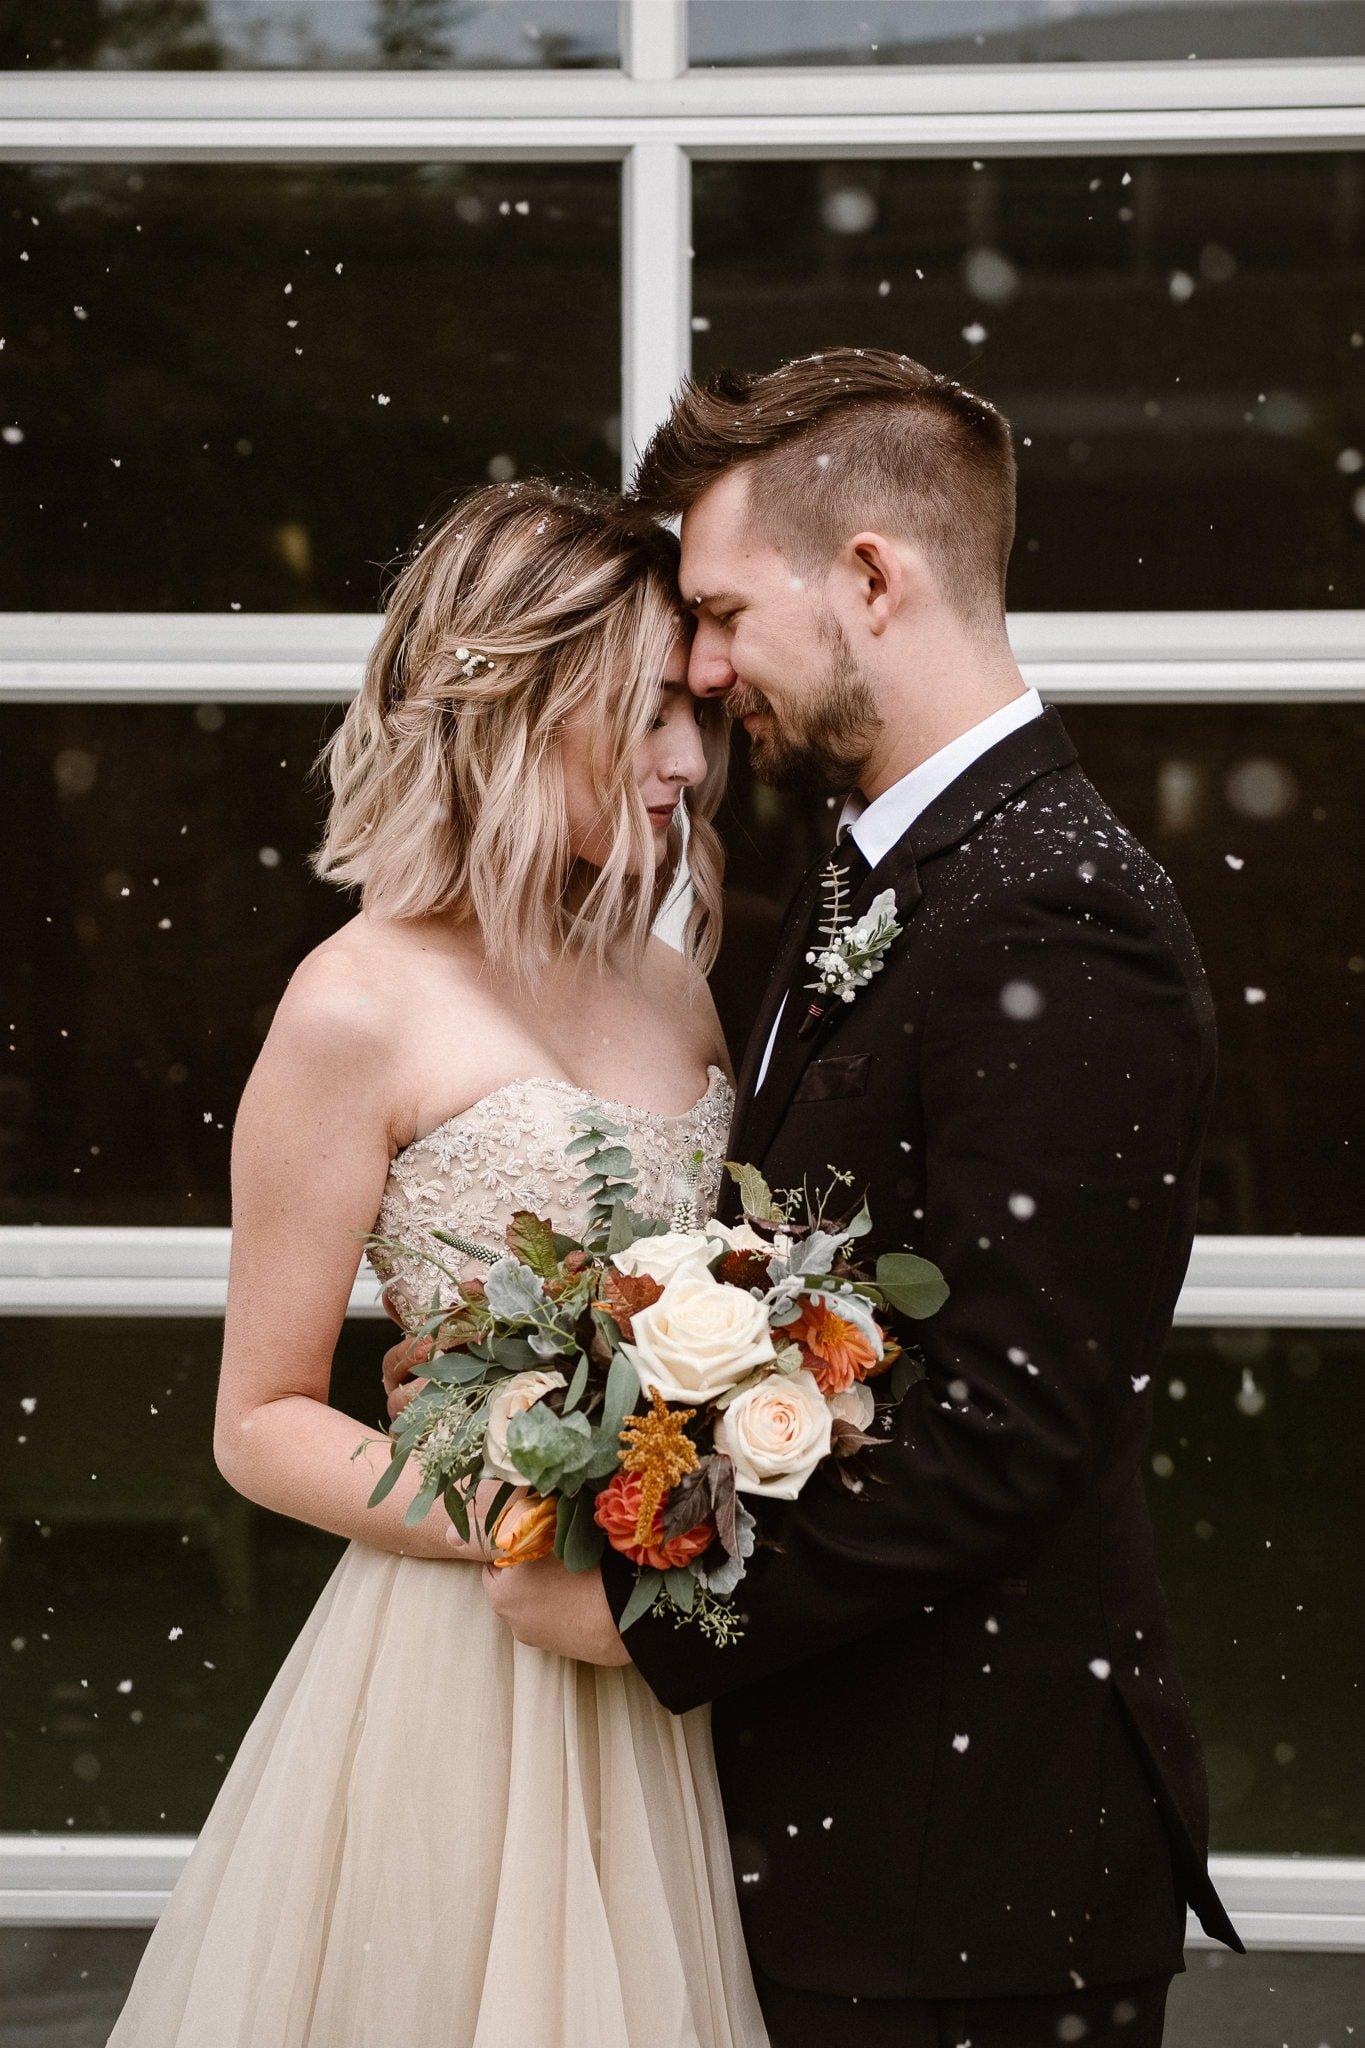 St Vrain Wedding Photographer   Longmont Wedding Photographer   Colorado Winter Wedding Photographer, Colorado industrial chic wedding, bride and groom portraits in snow